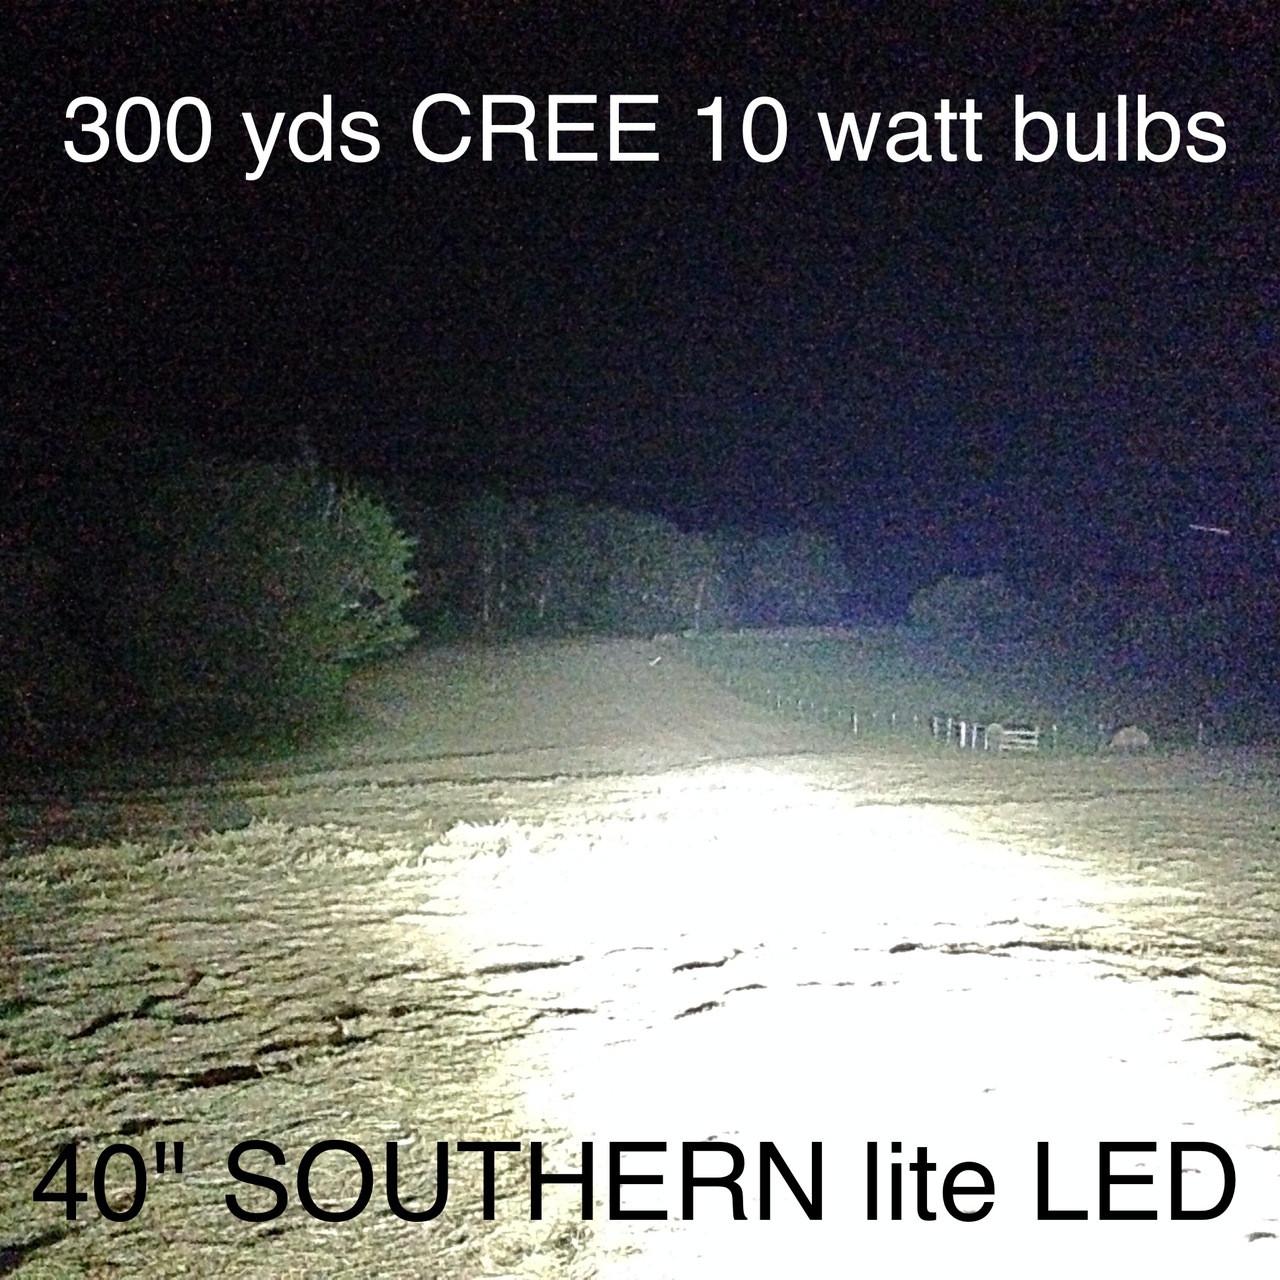 The Cree 10Watt  bulbs Shine further than any 3 watt bulb.